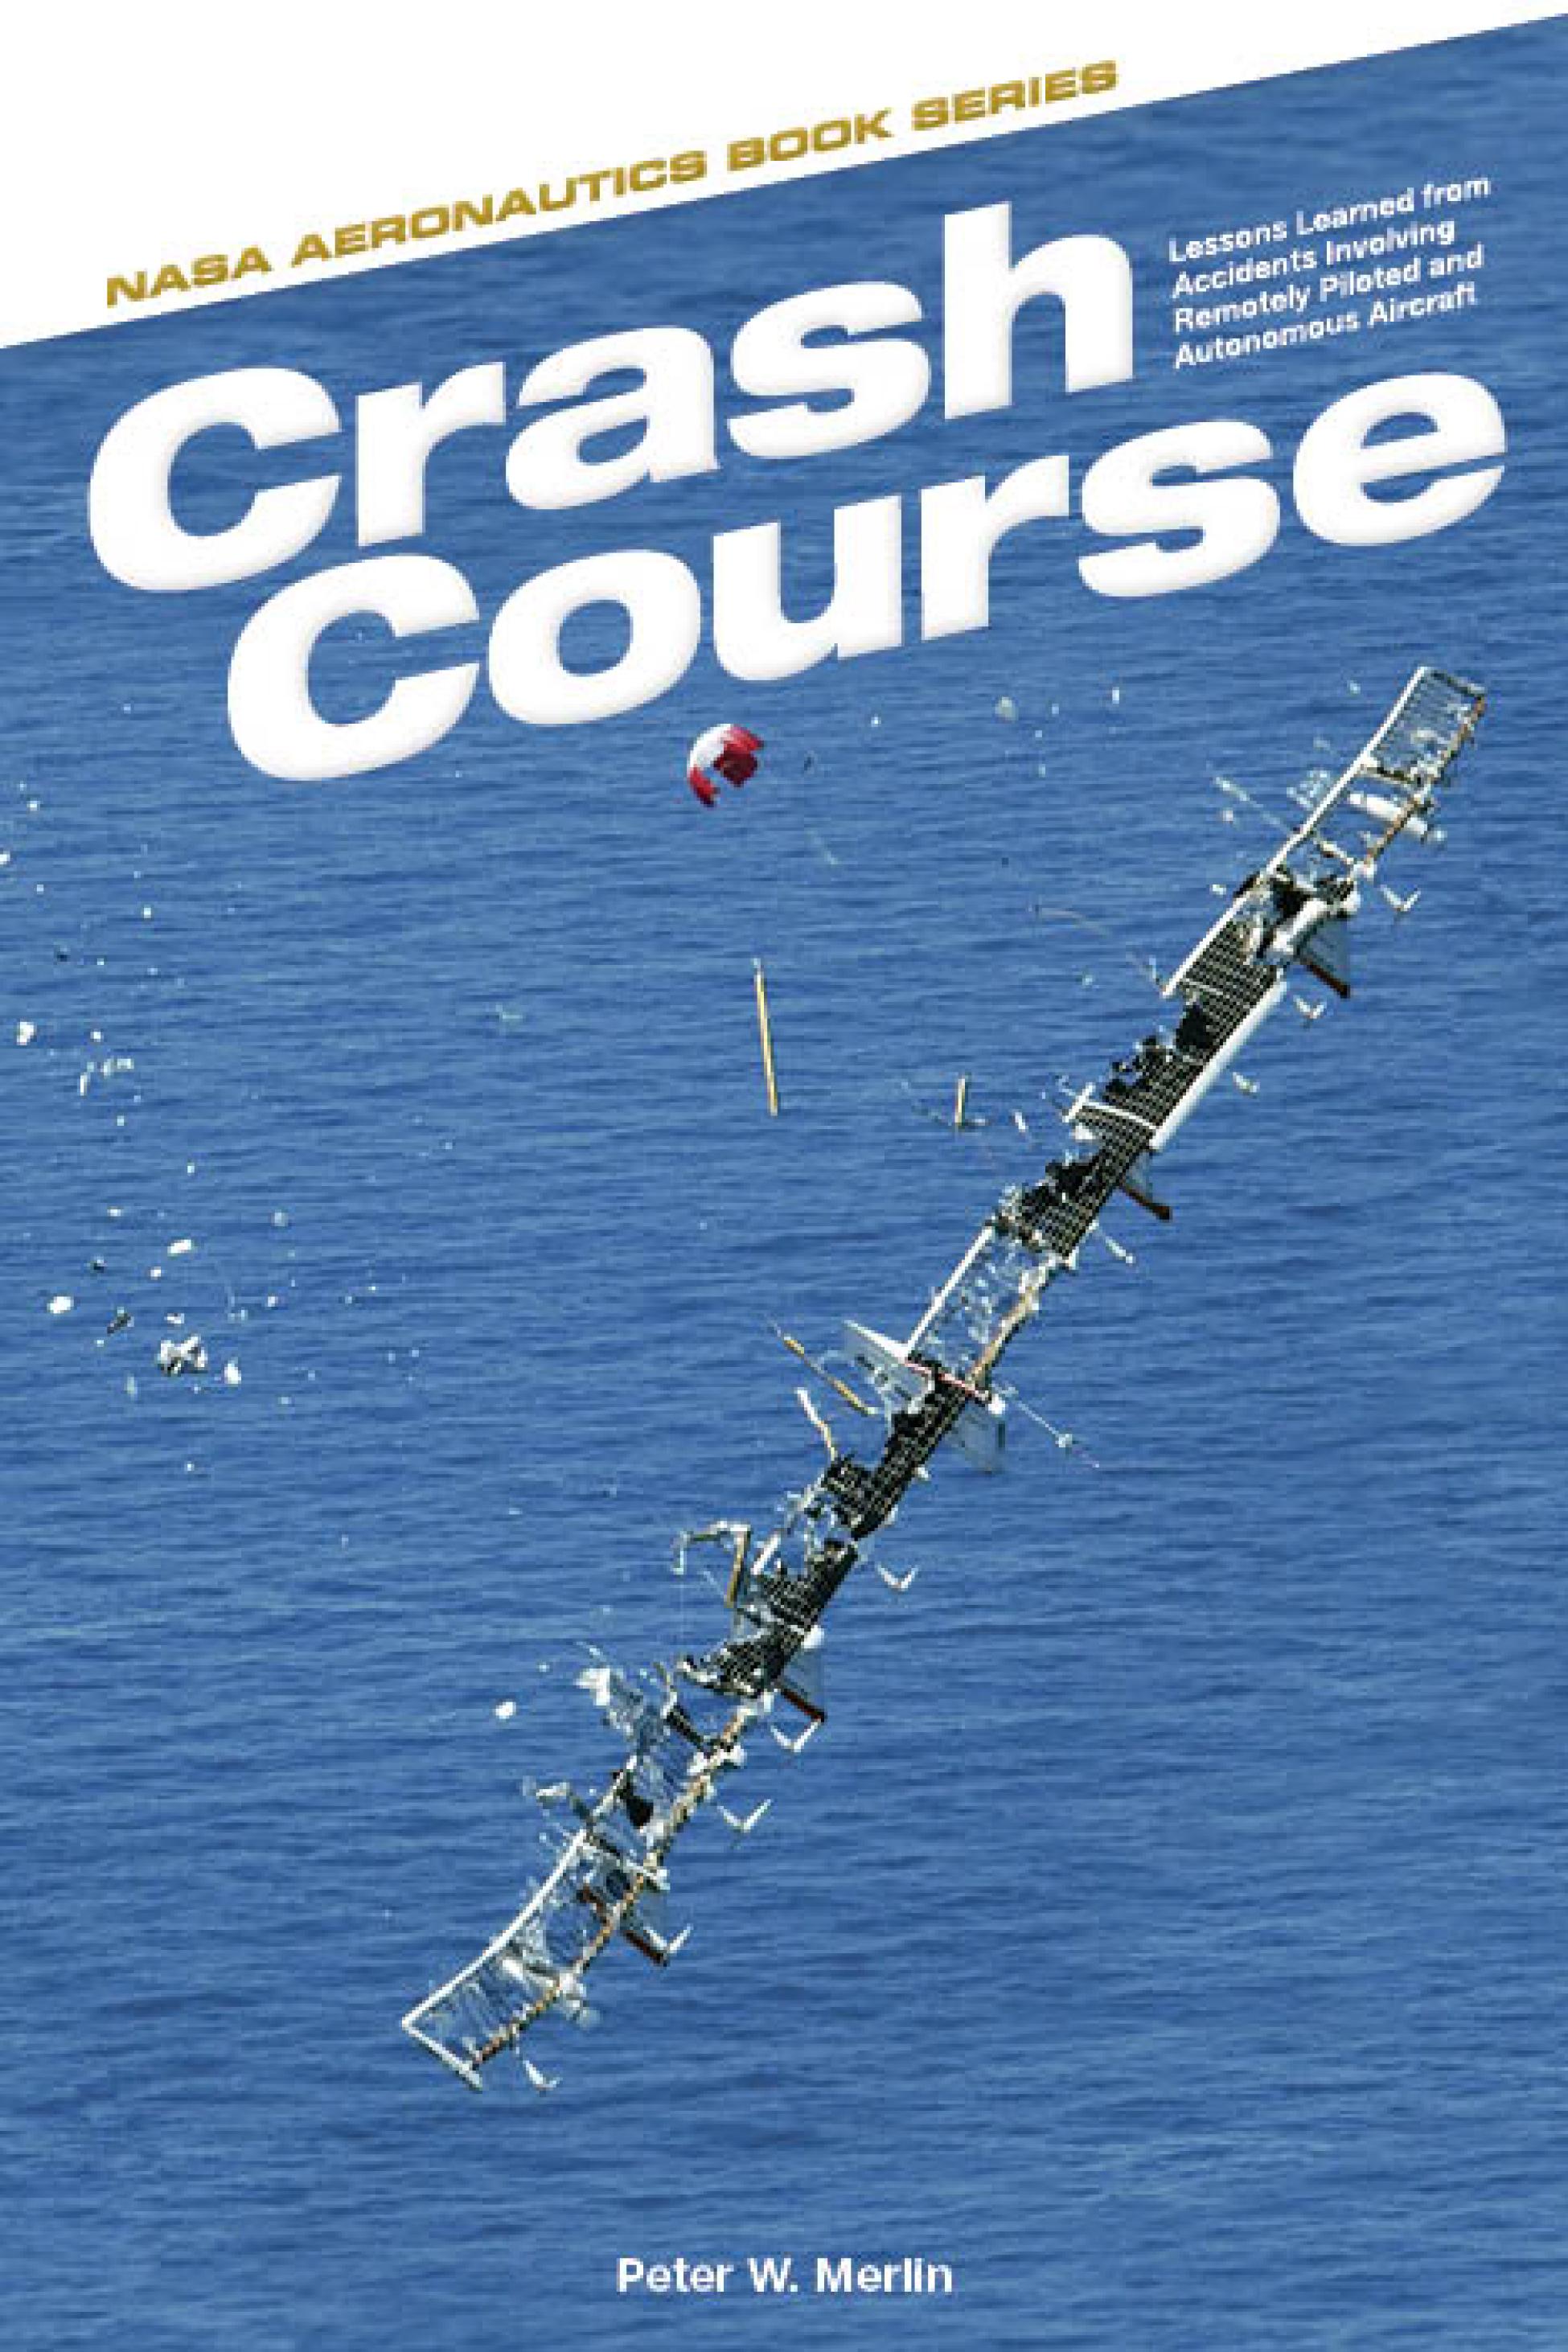 Crash Course Book Cover Showing The Helios Prototype Sheds Parts As It  Plummets Toward The Ocean